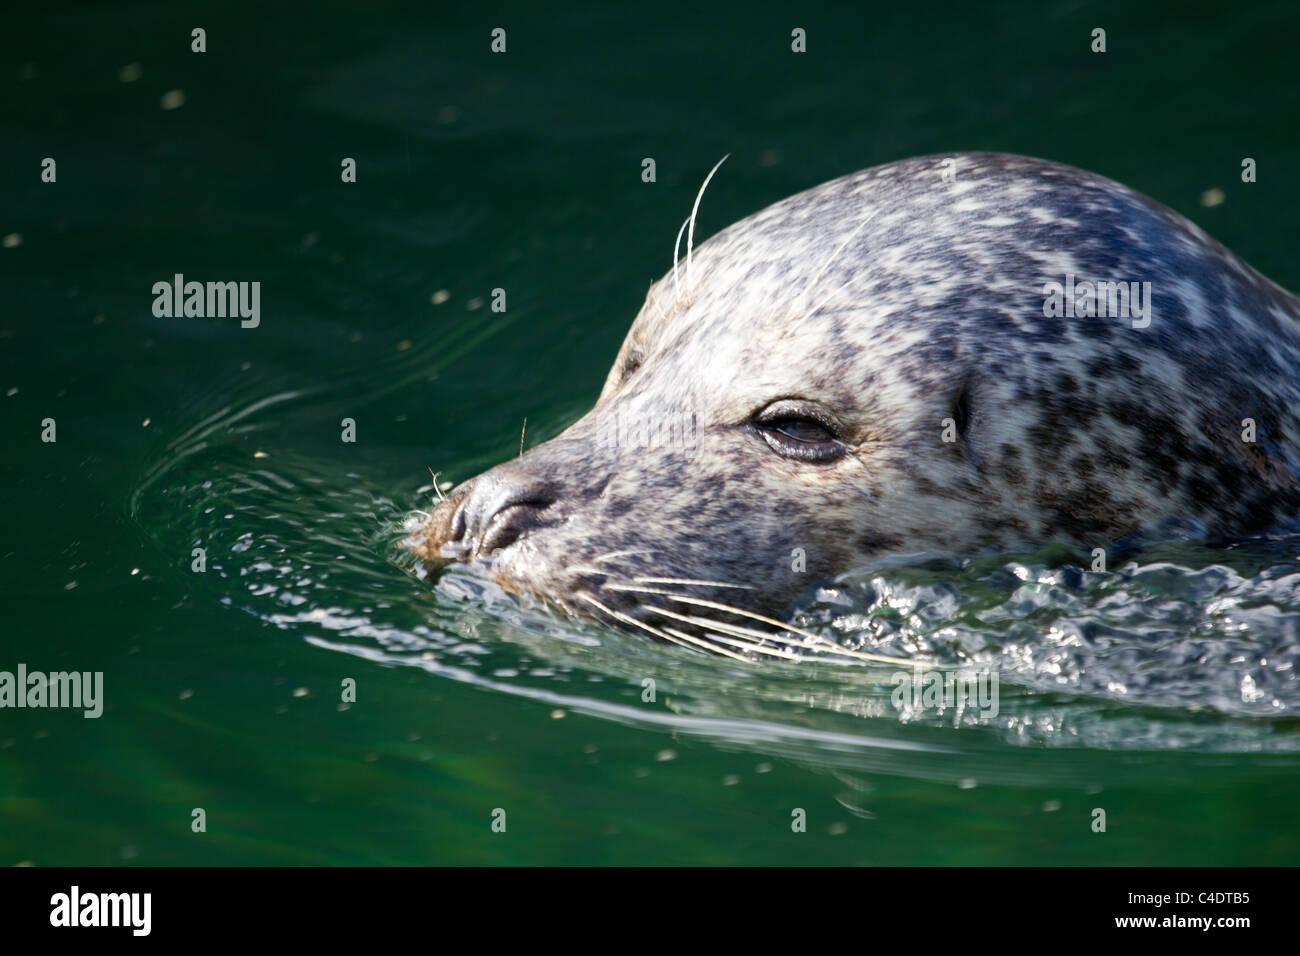 Seal - Stock Image